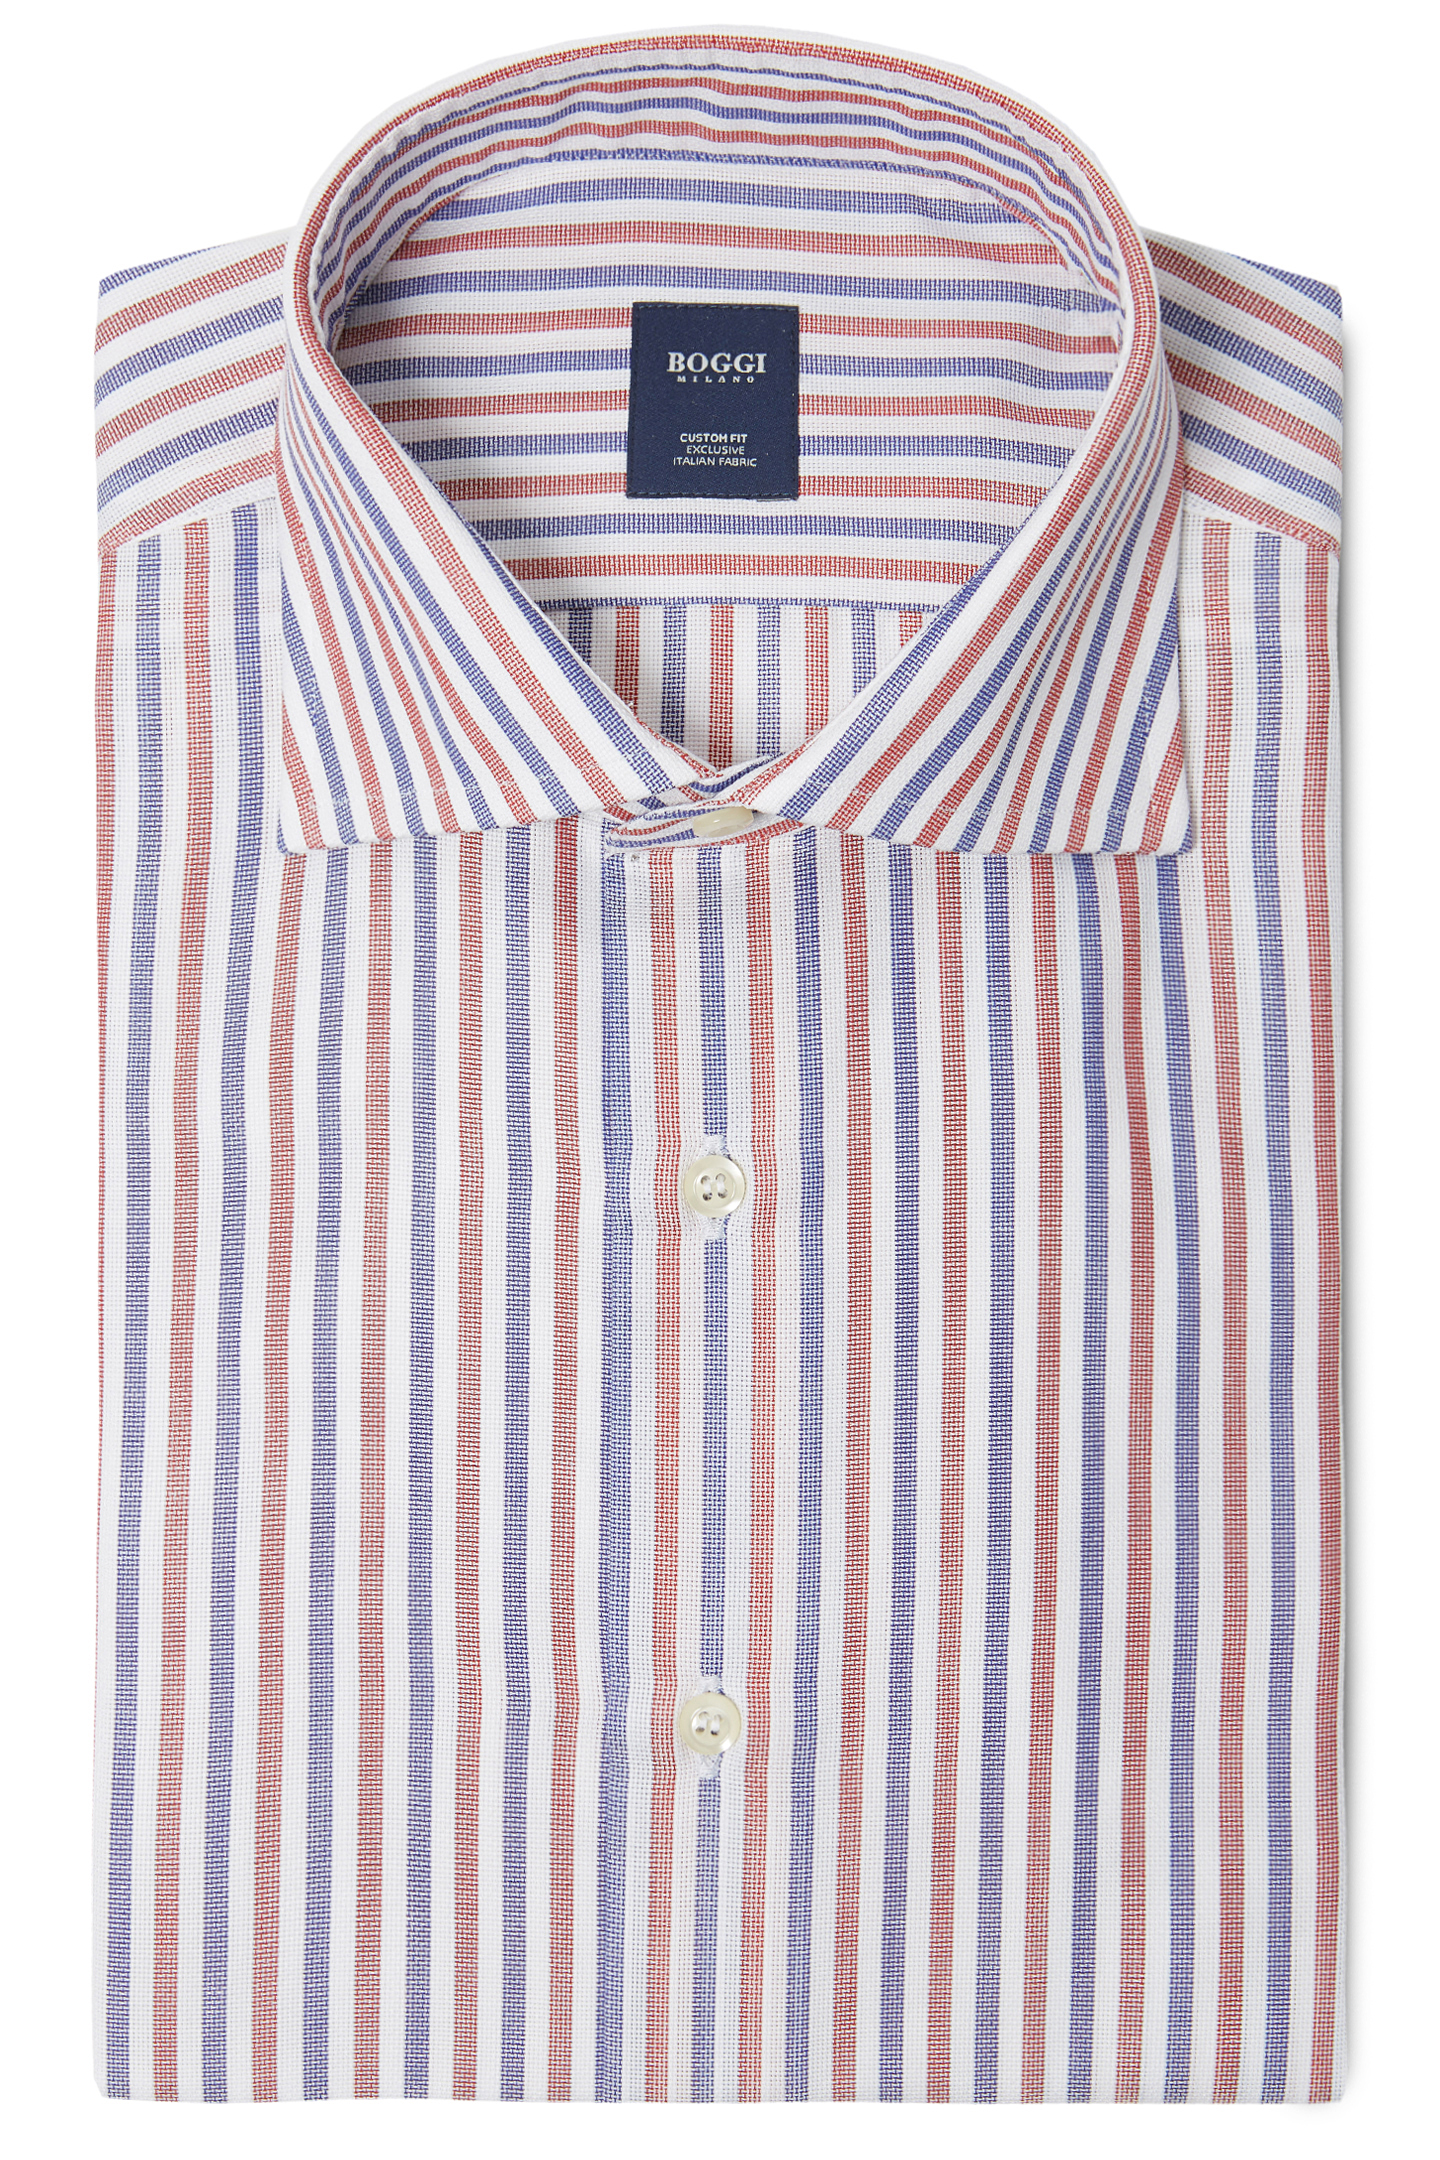 Custom Fit Textured Cotton Shirt With Windsor Collar Boggi